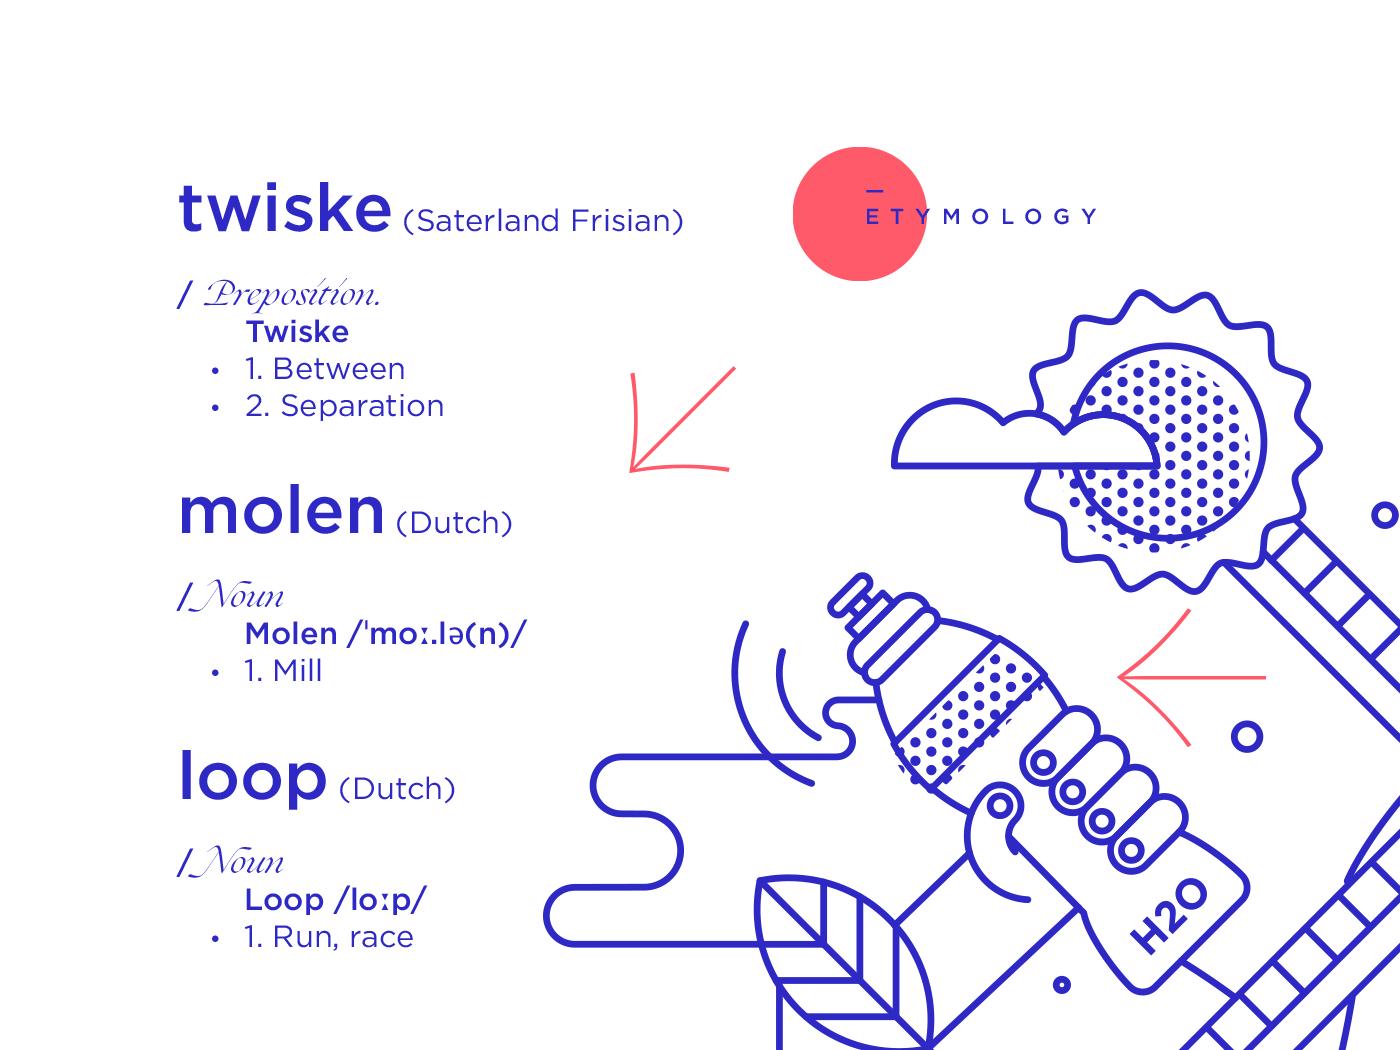 Line art illustration + Etymology